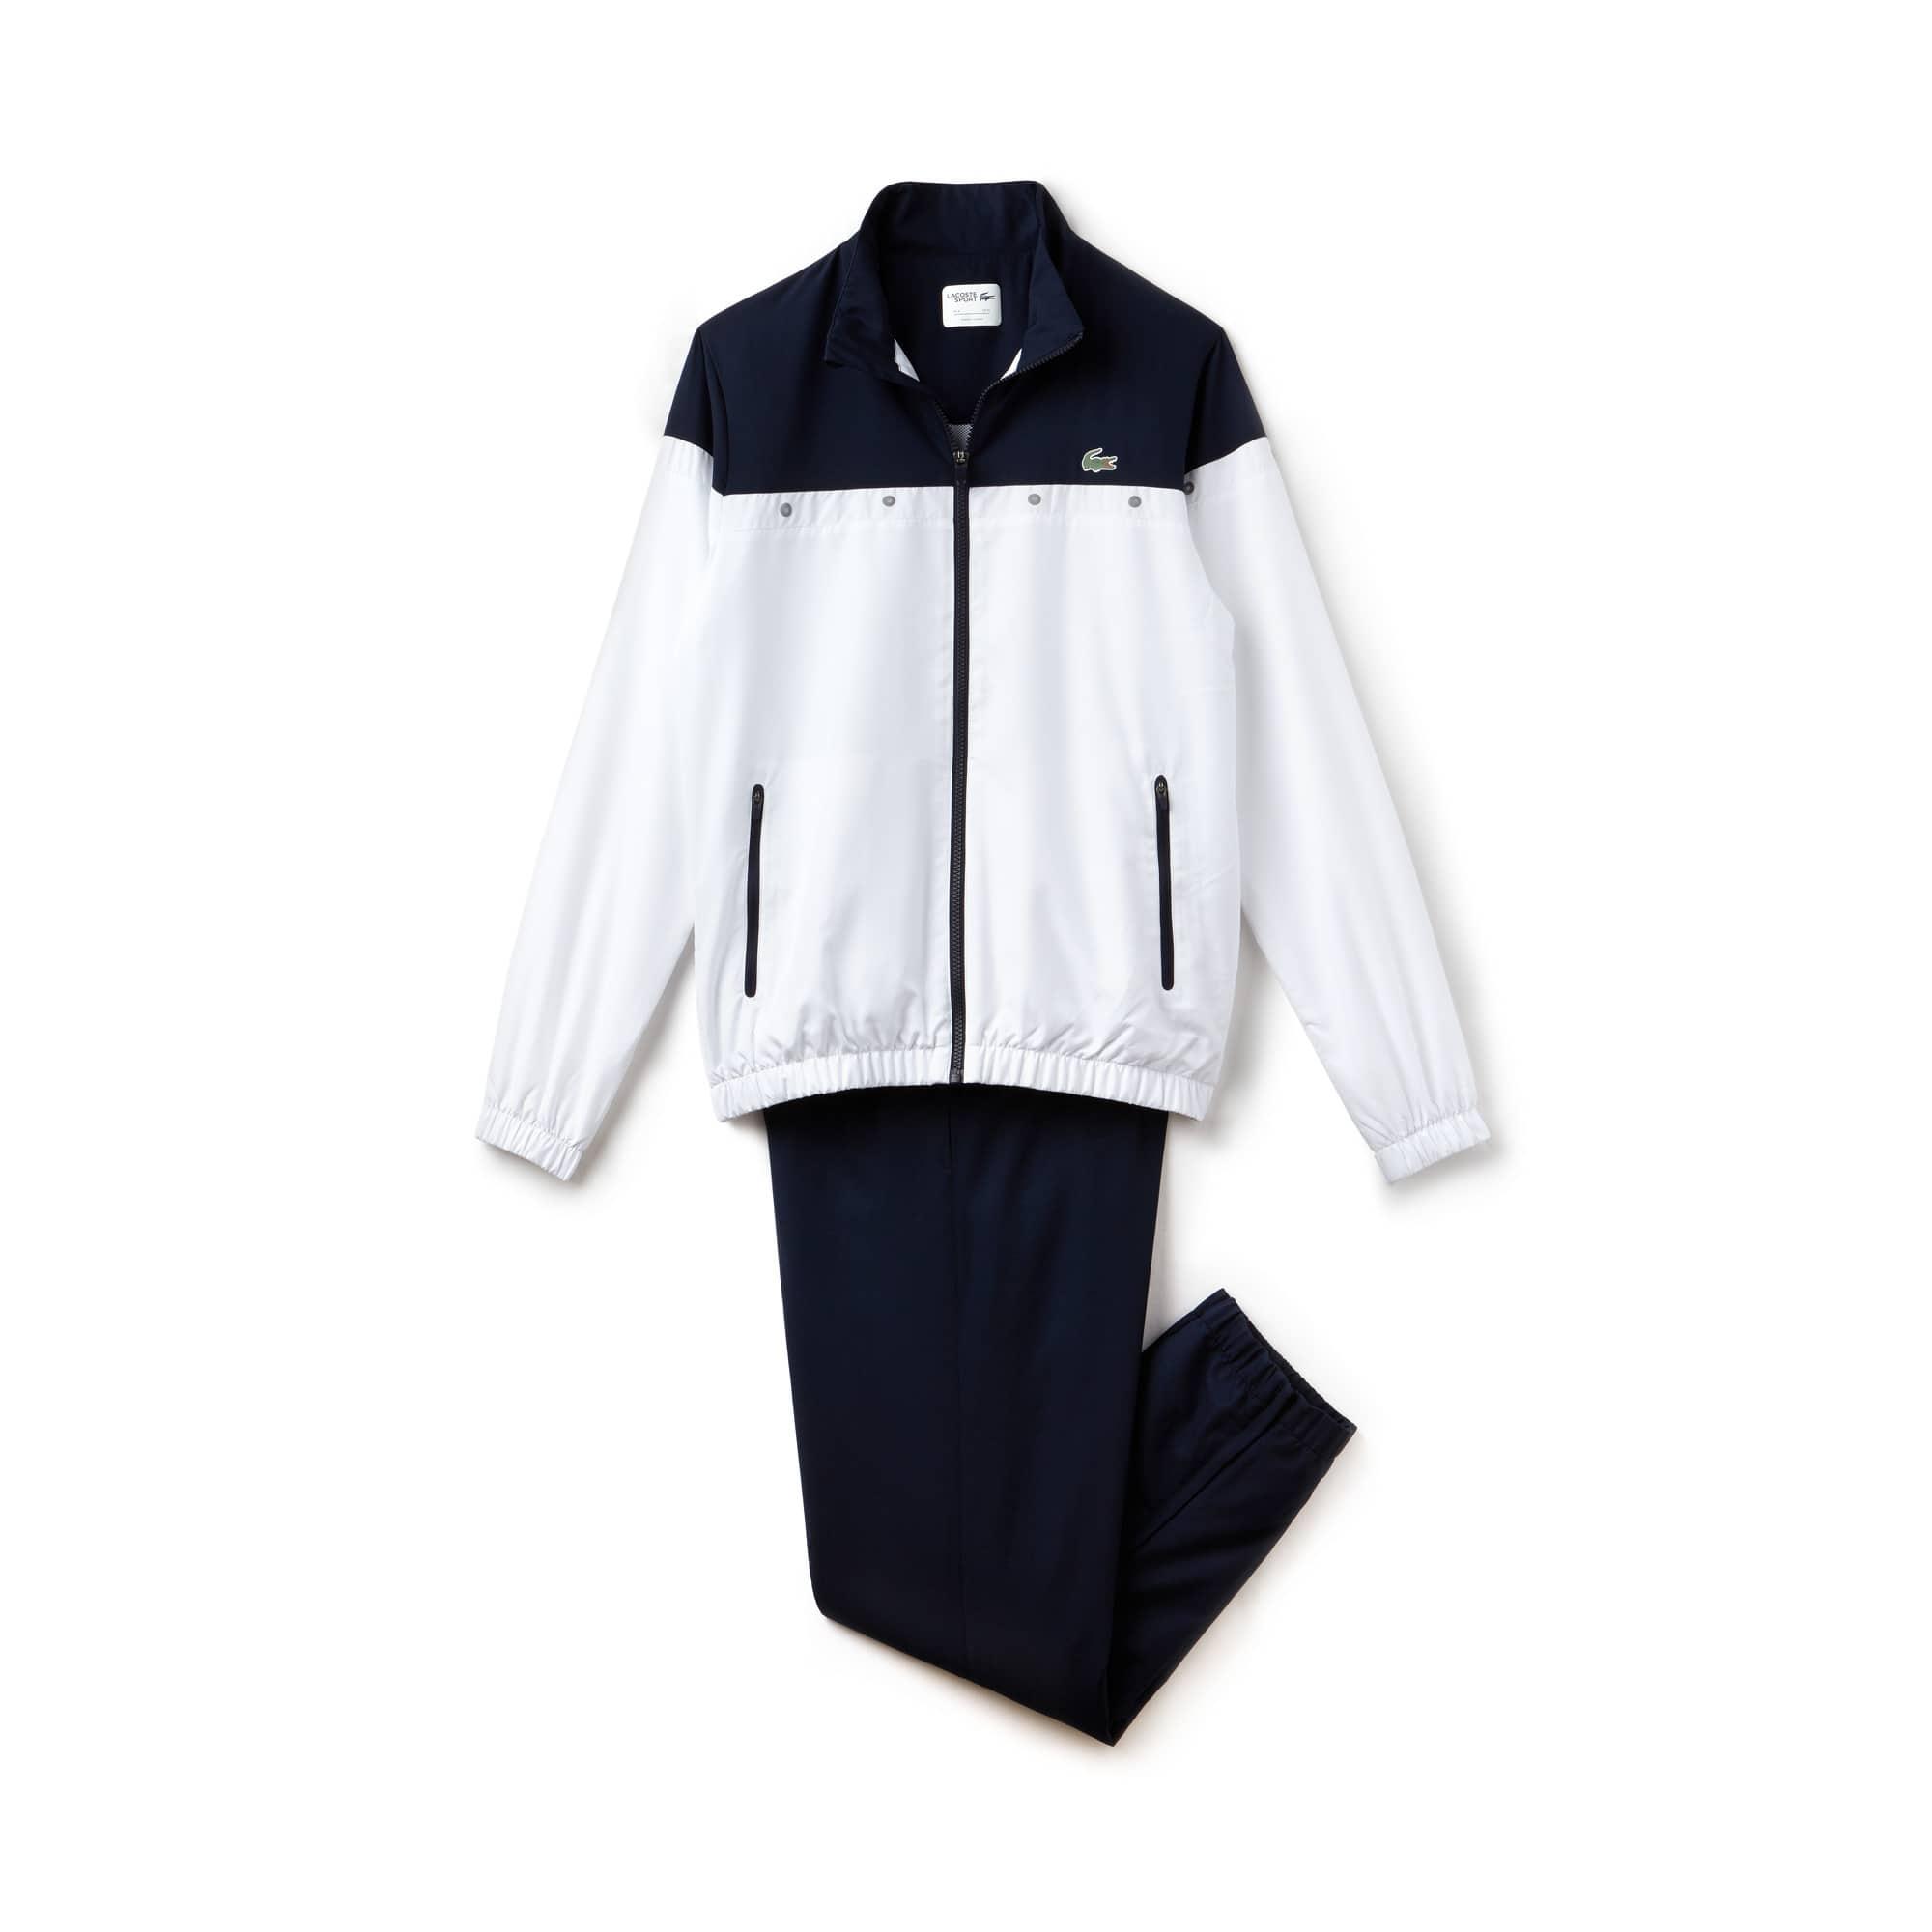 Herren-Trainingsanzug im Colorblock-Design LACOSTE SPORT TENNIS